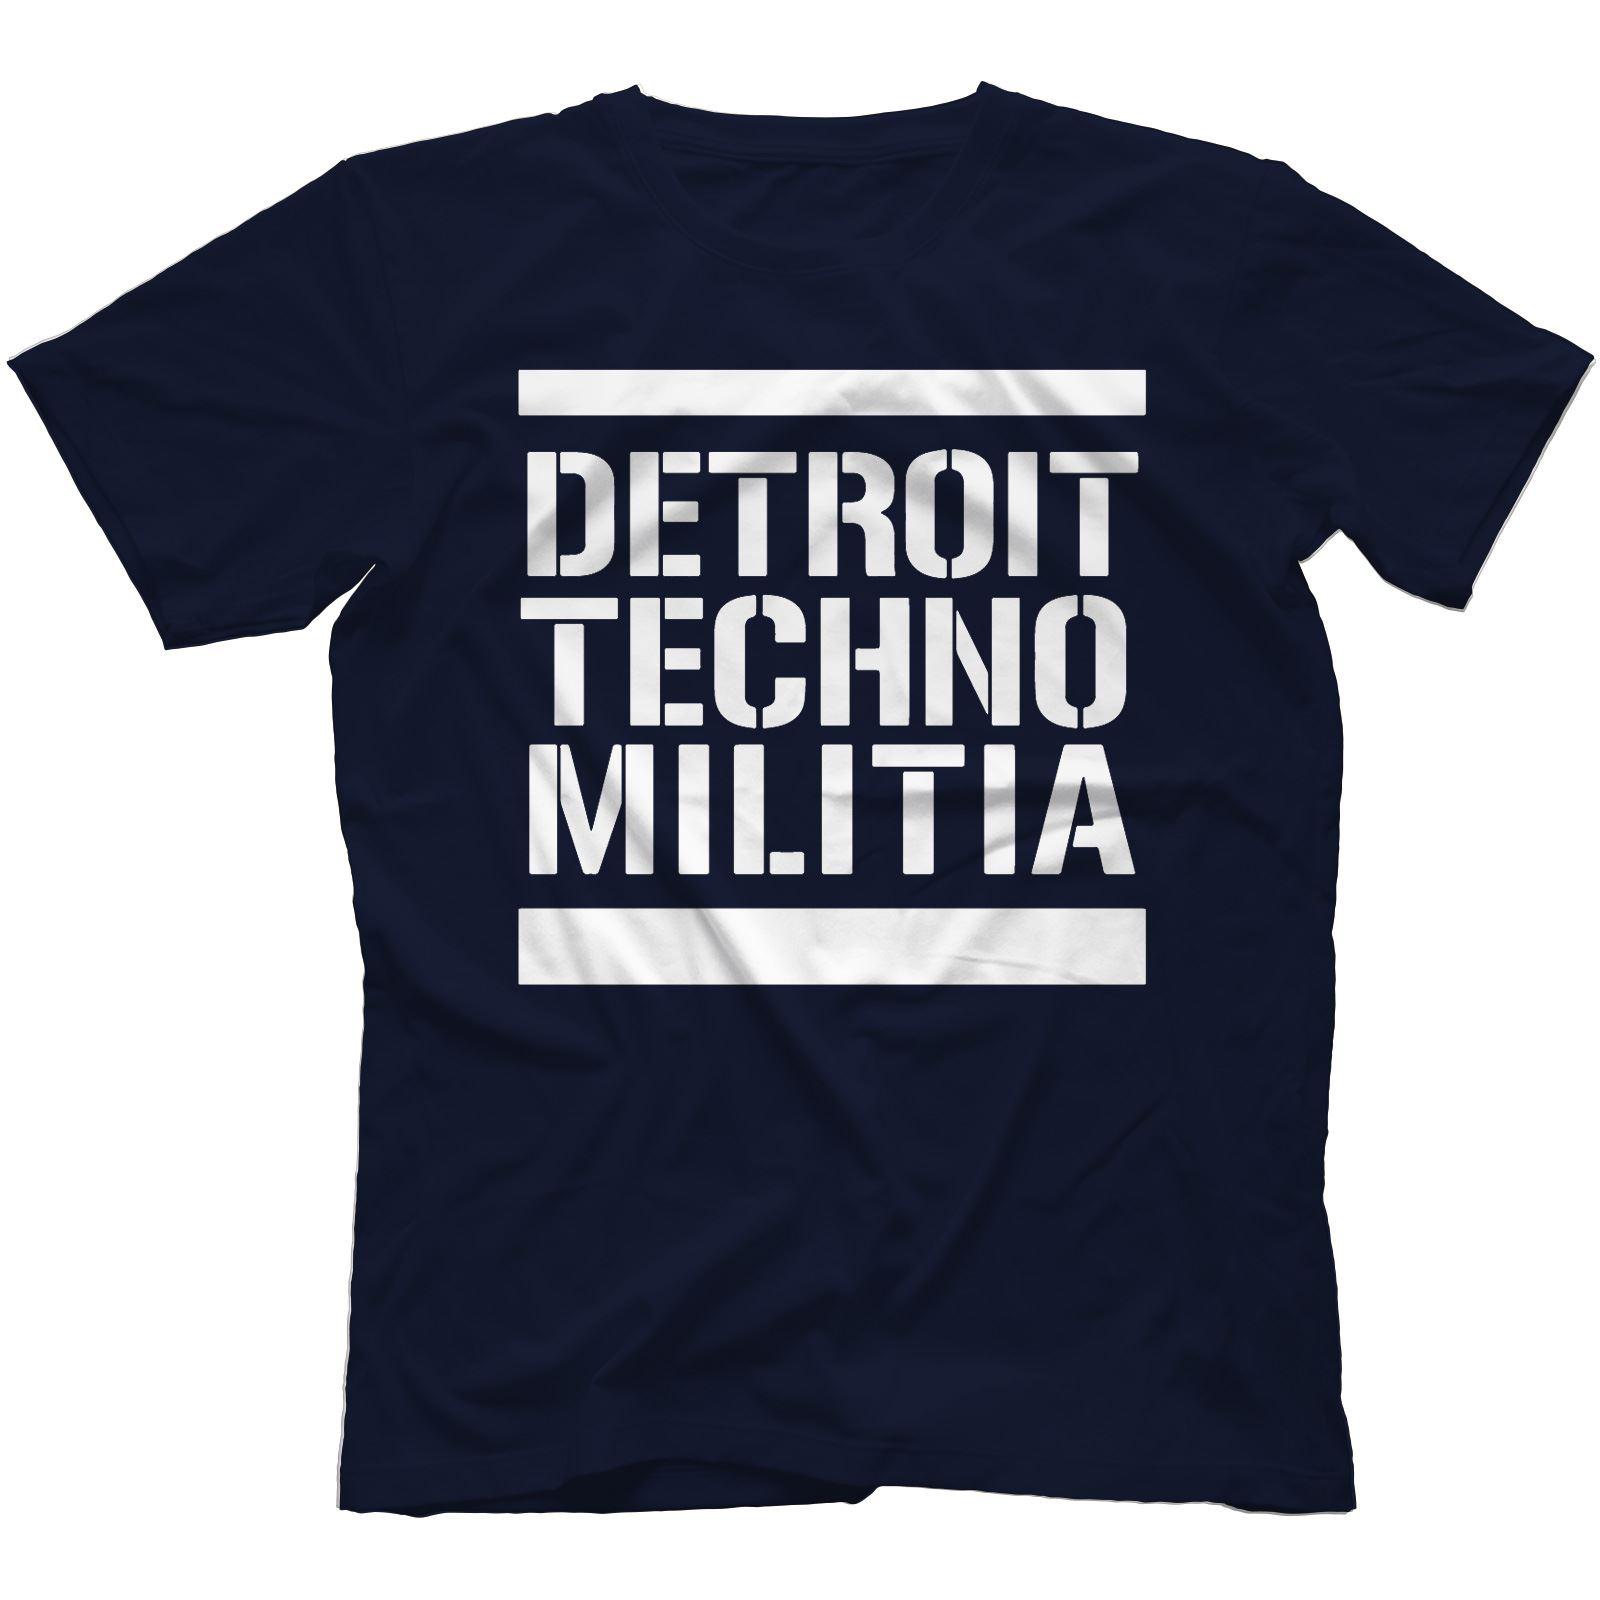 Detroit-Techno-Militia-T-Shirt-100-Cotton-Vinyl-909-Underground-Resistance Indexbild 32